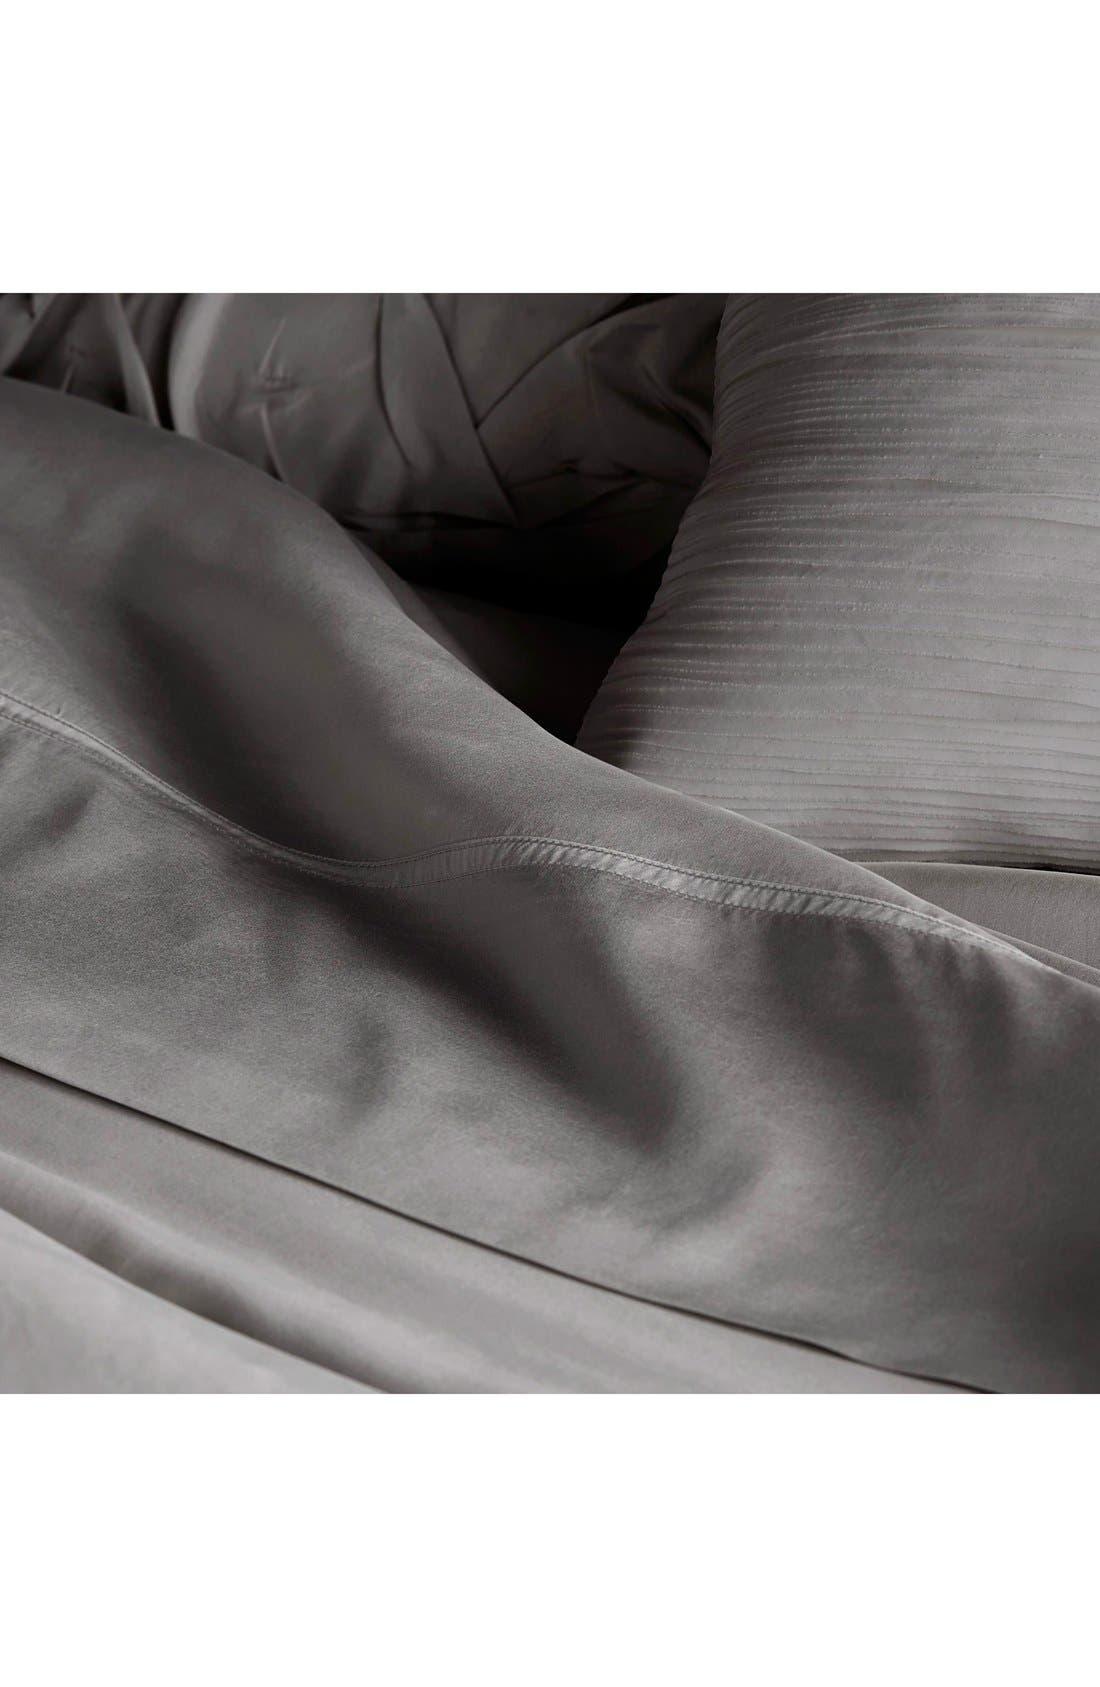 Donna Karan Collection 'Silk Essentials' Habutai Silk Pillowcase,                             Alternate thumbnail 2, color,                             020